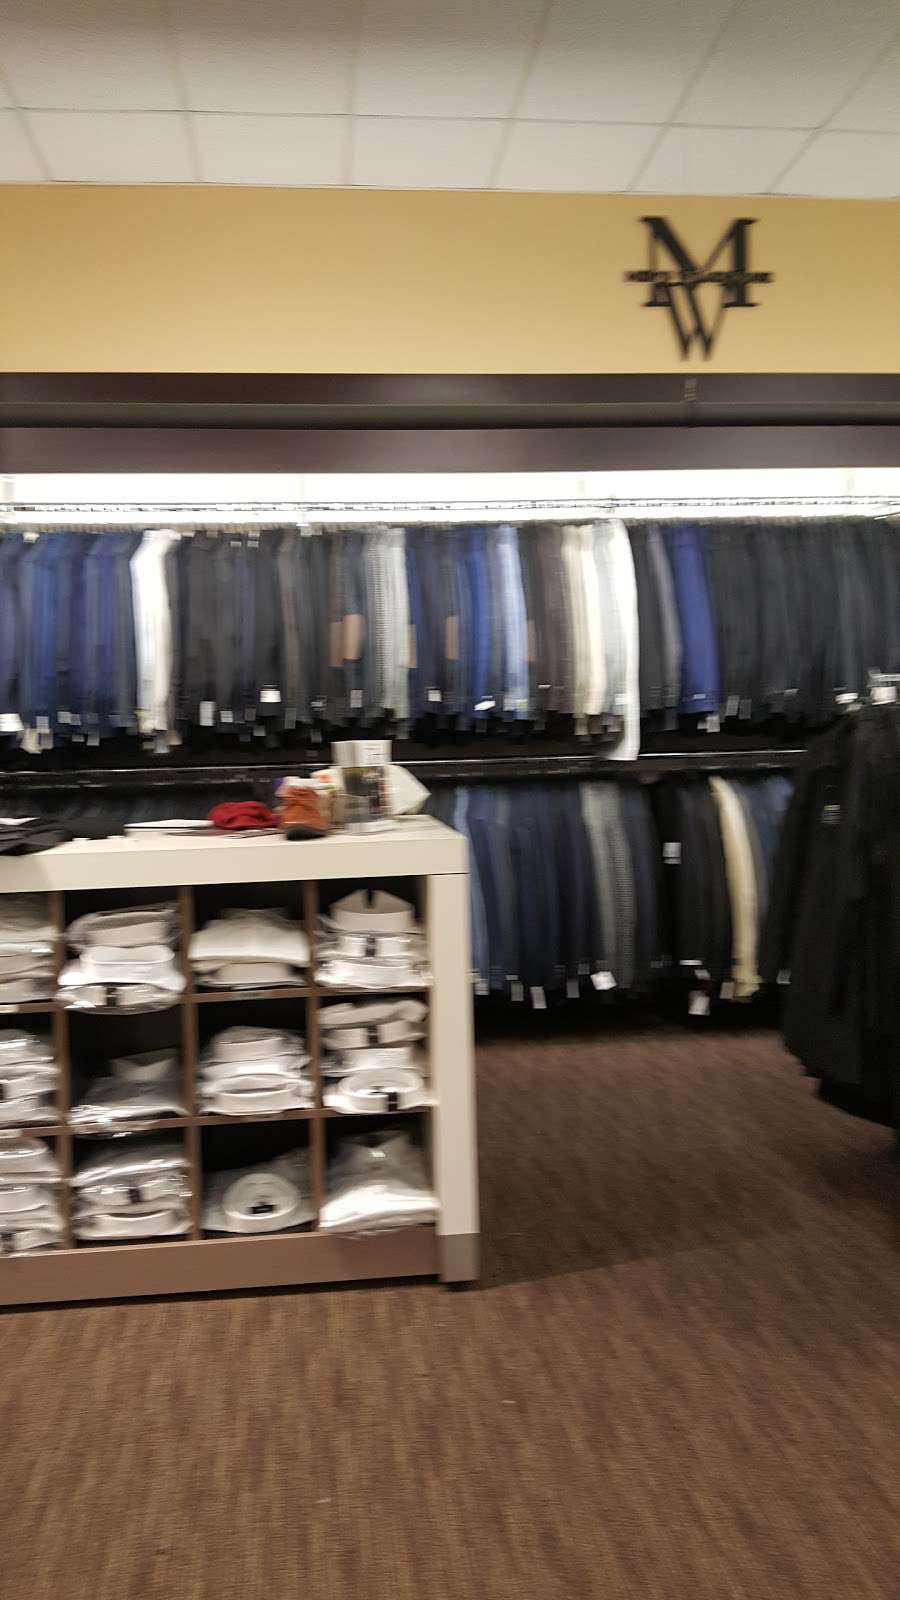 Mens Wearhouse - clothing store  | Photo 3 of 10 | Address: 18407 Hawthorne Blvd, Torrance, CA 90504, USA | Phone: (310) 370-9788